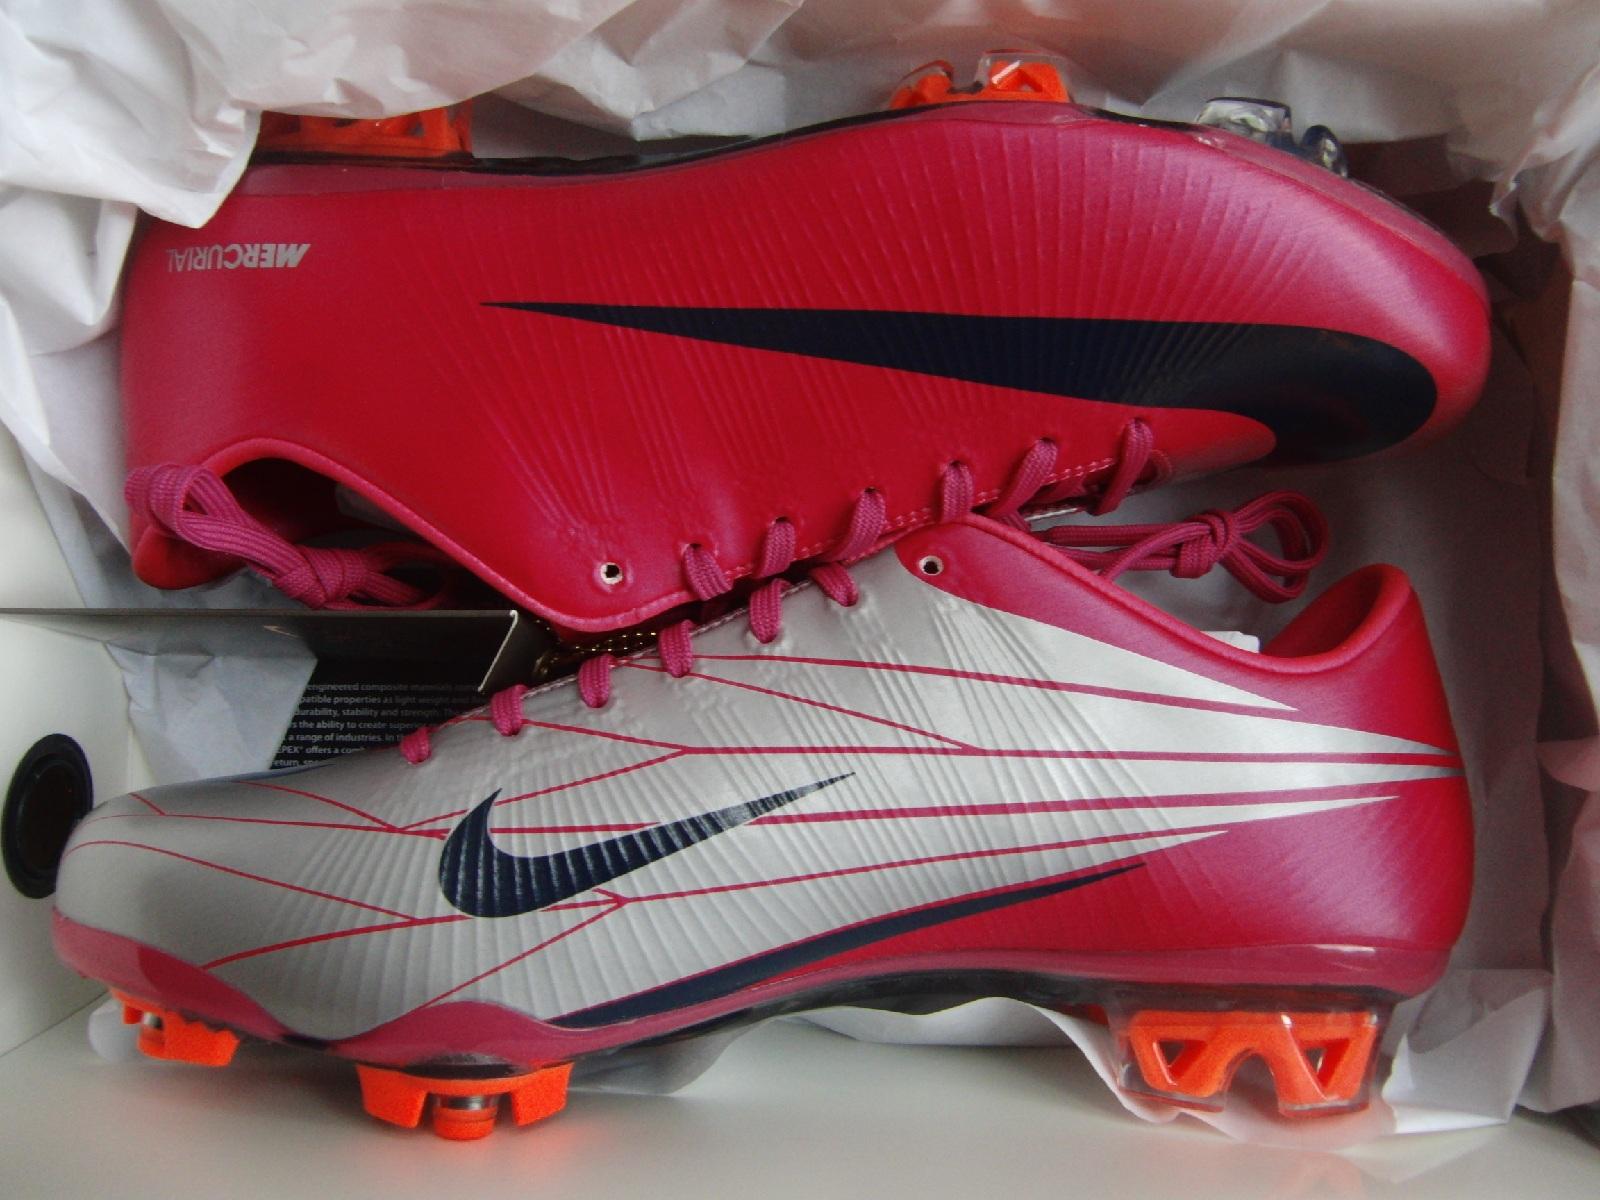 Nike soccer cleats tiempo 2010